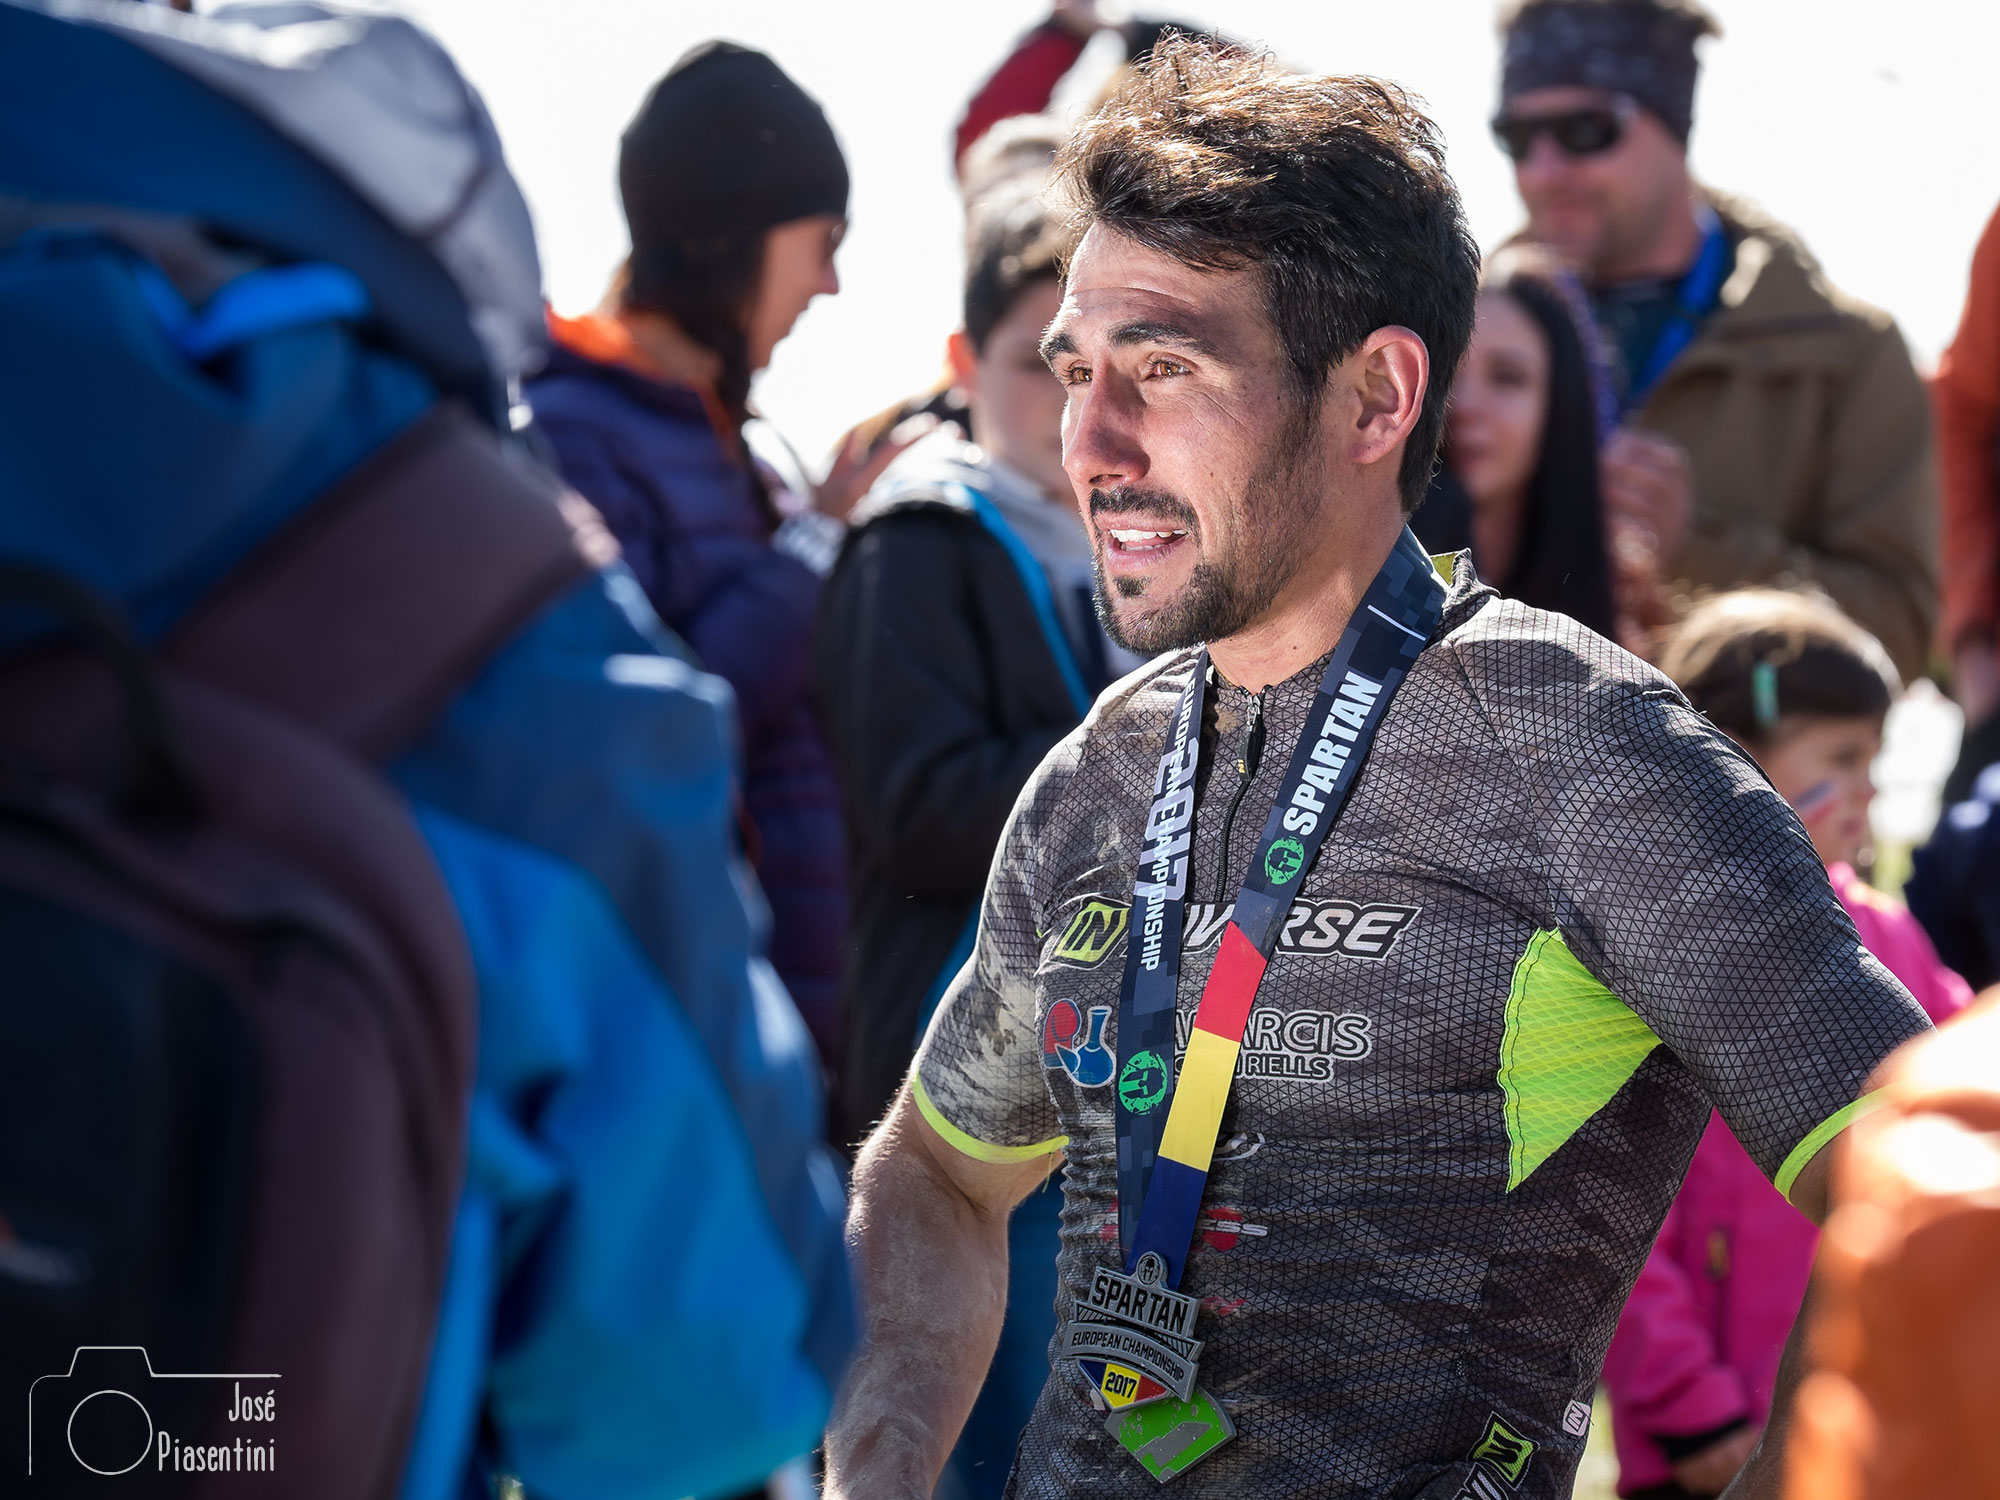 Albert Soley Castells Spartan Andorra Encamp 2017